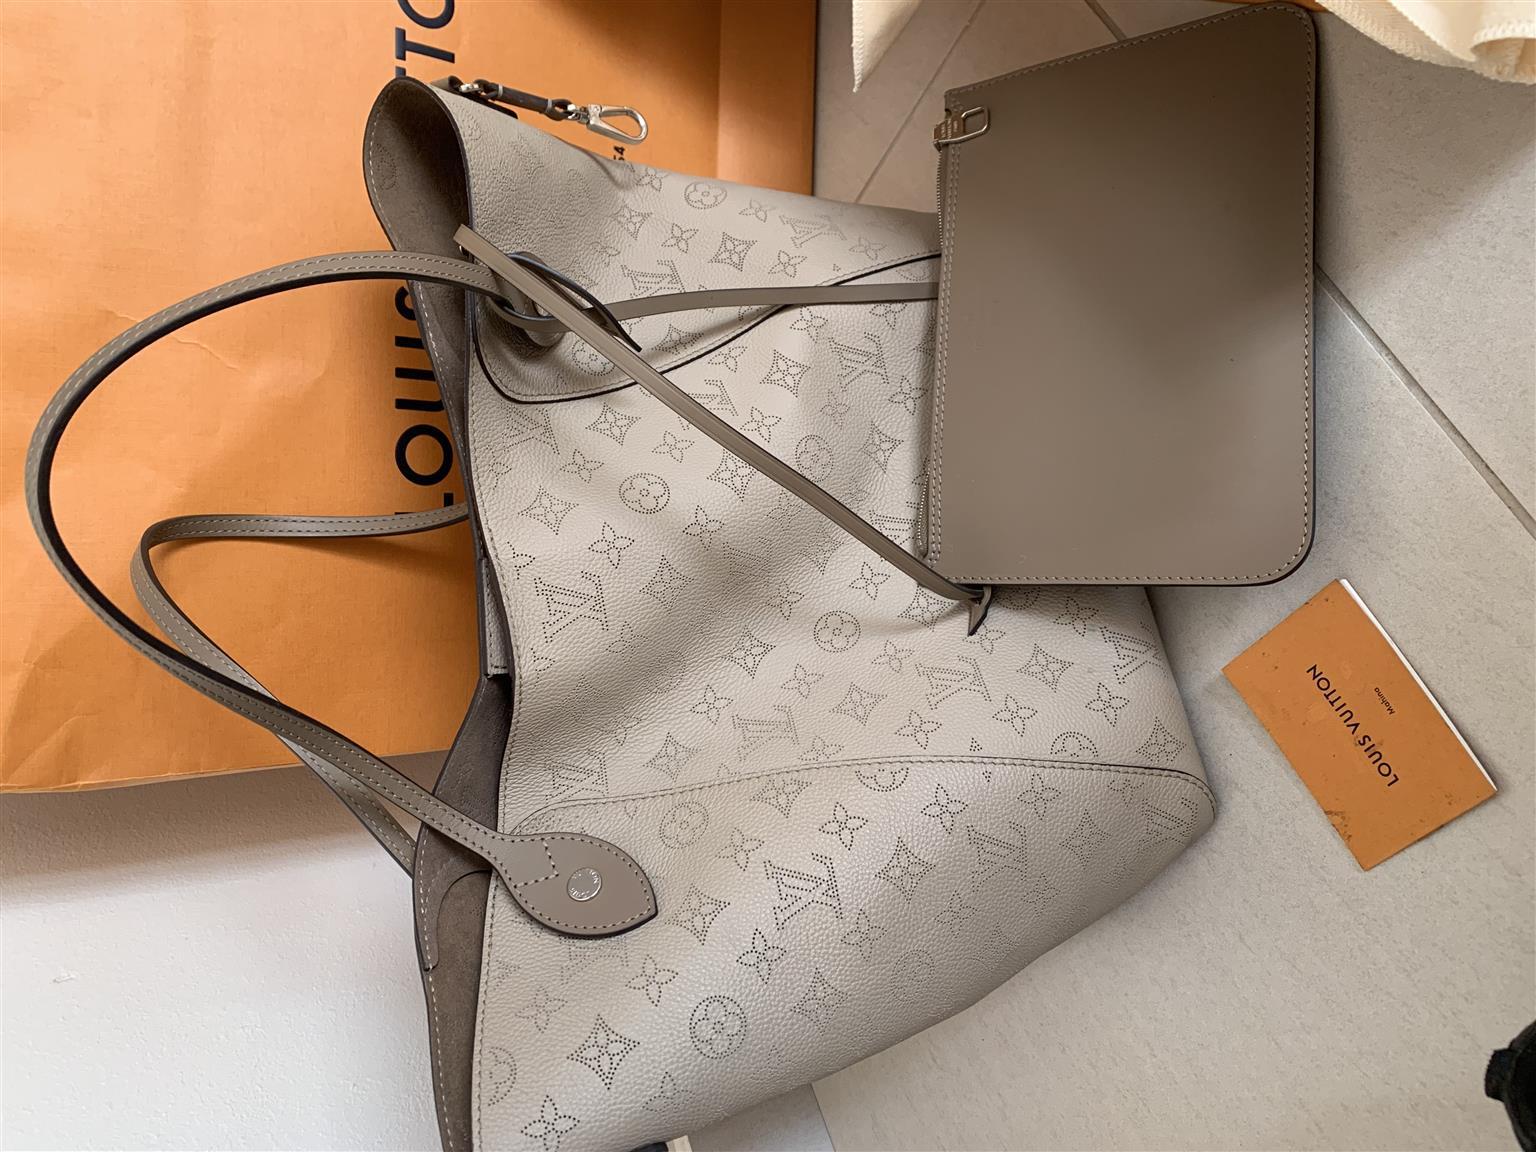 Authentic Louis Vuitton Mahina Hina MM